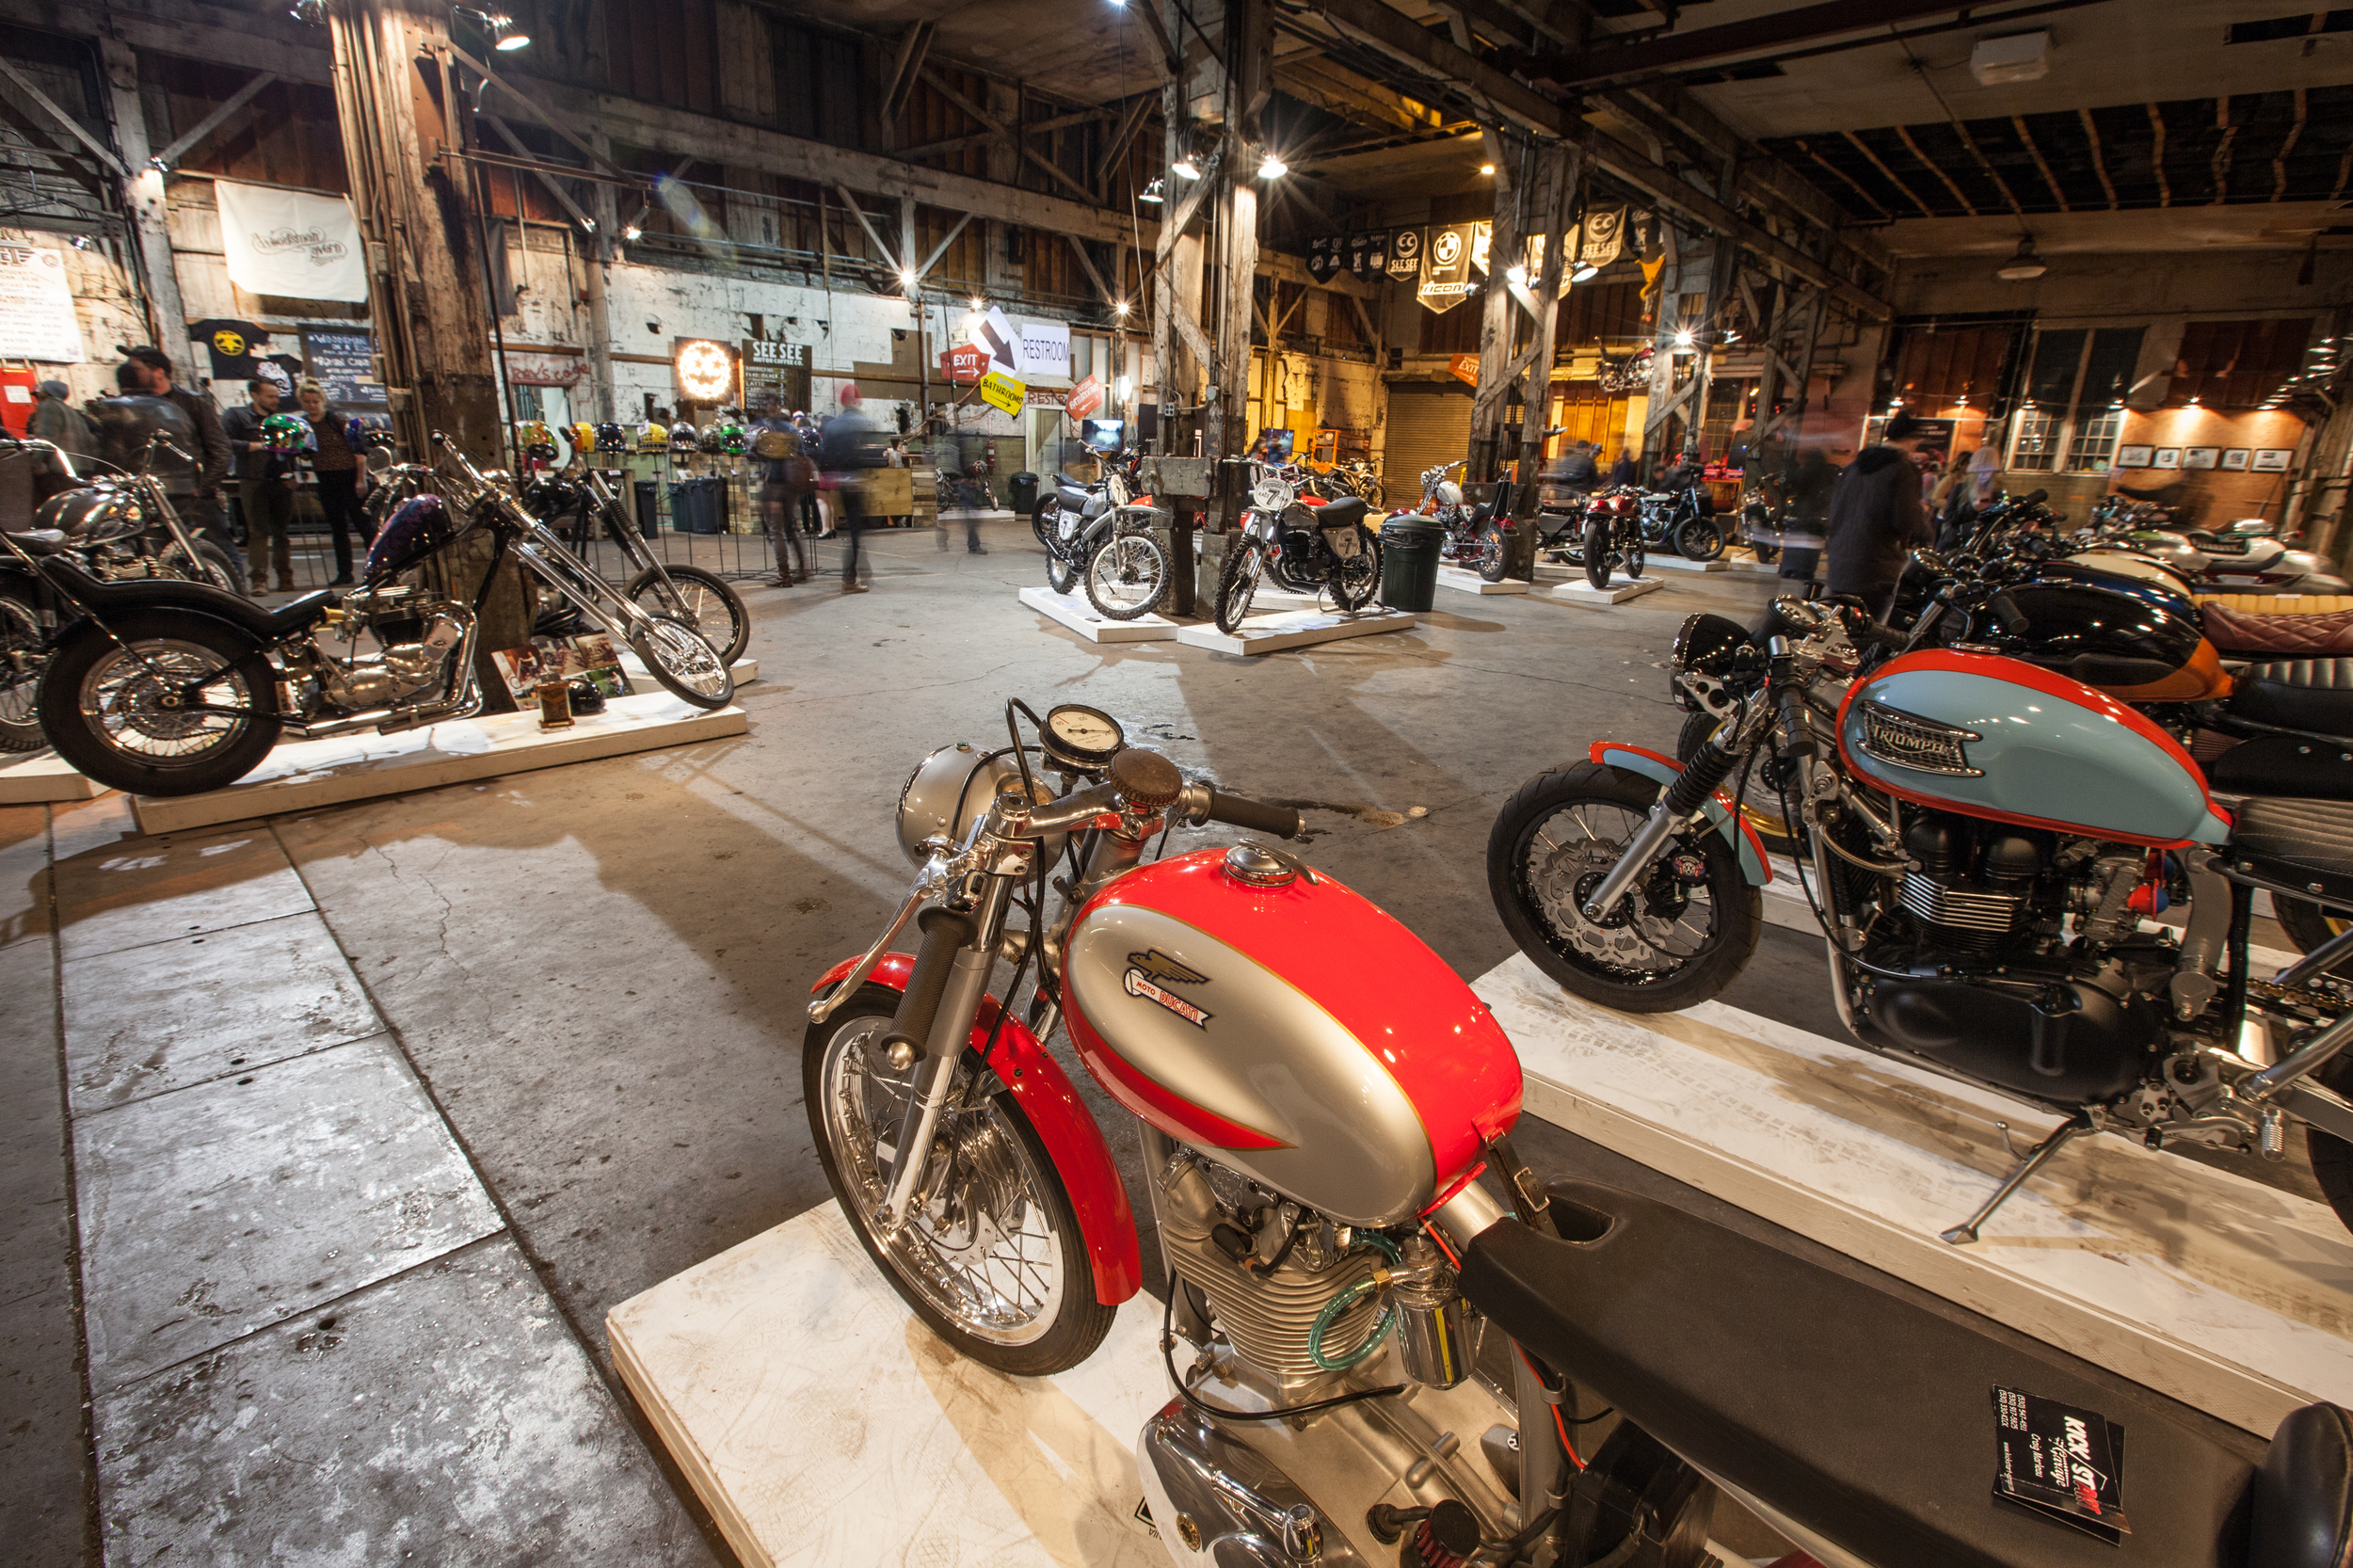 02-14-15 The 1 Moto Show - 2_-61-31.jpg